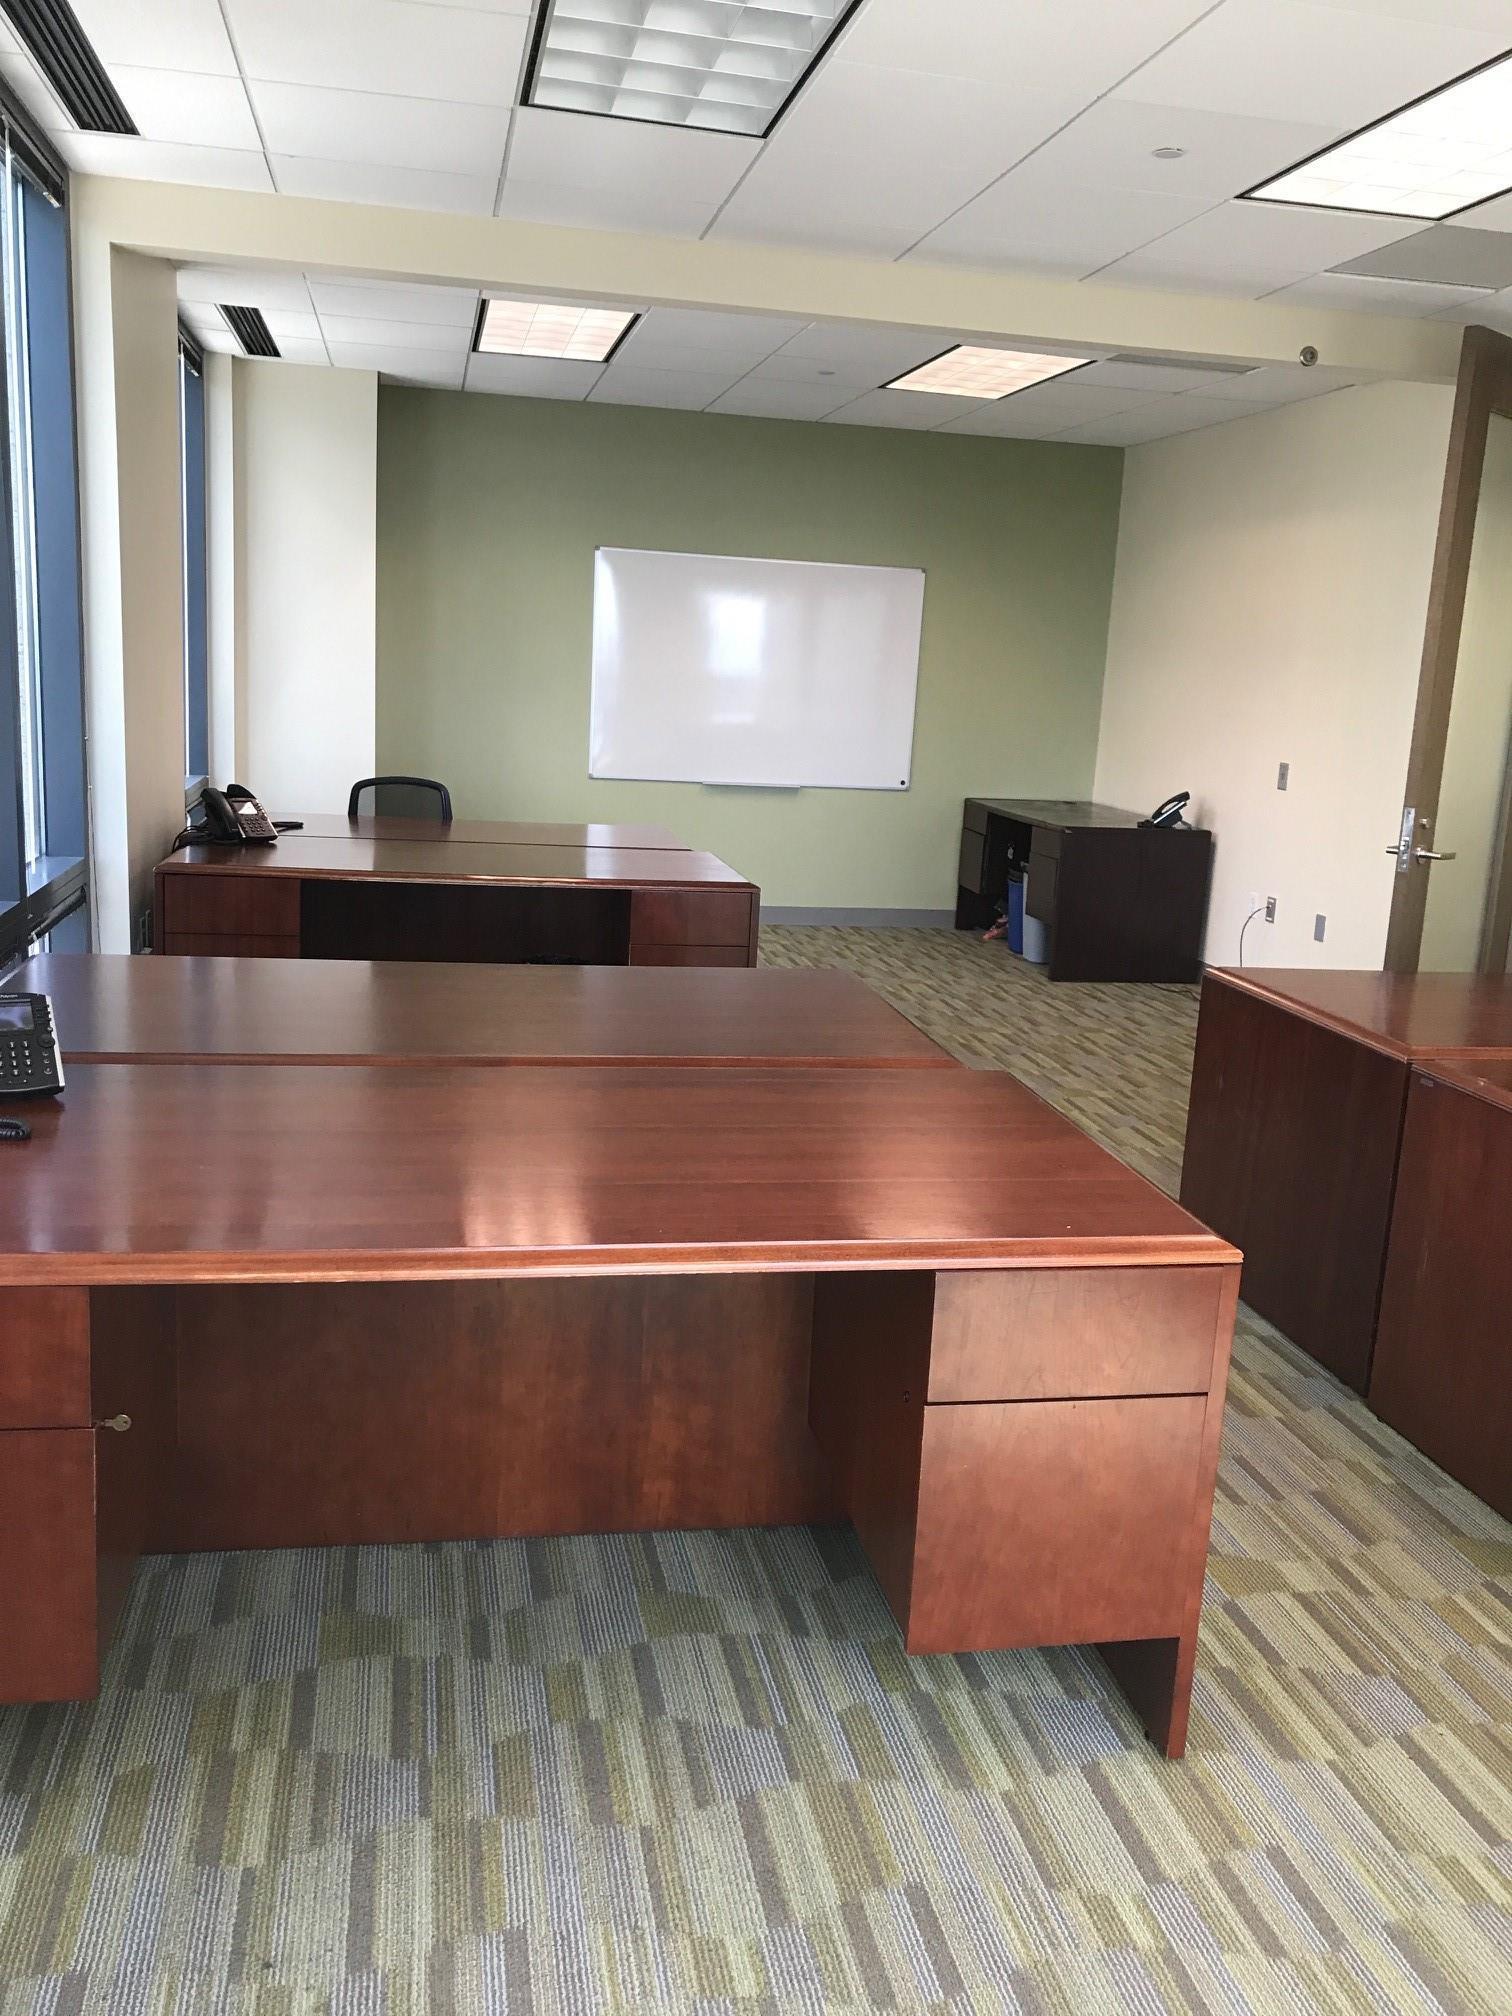 Carr Workplaces - Las Olas Center - Office 1412